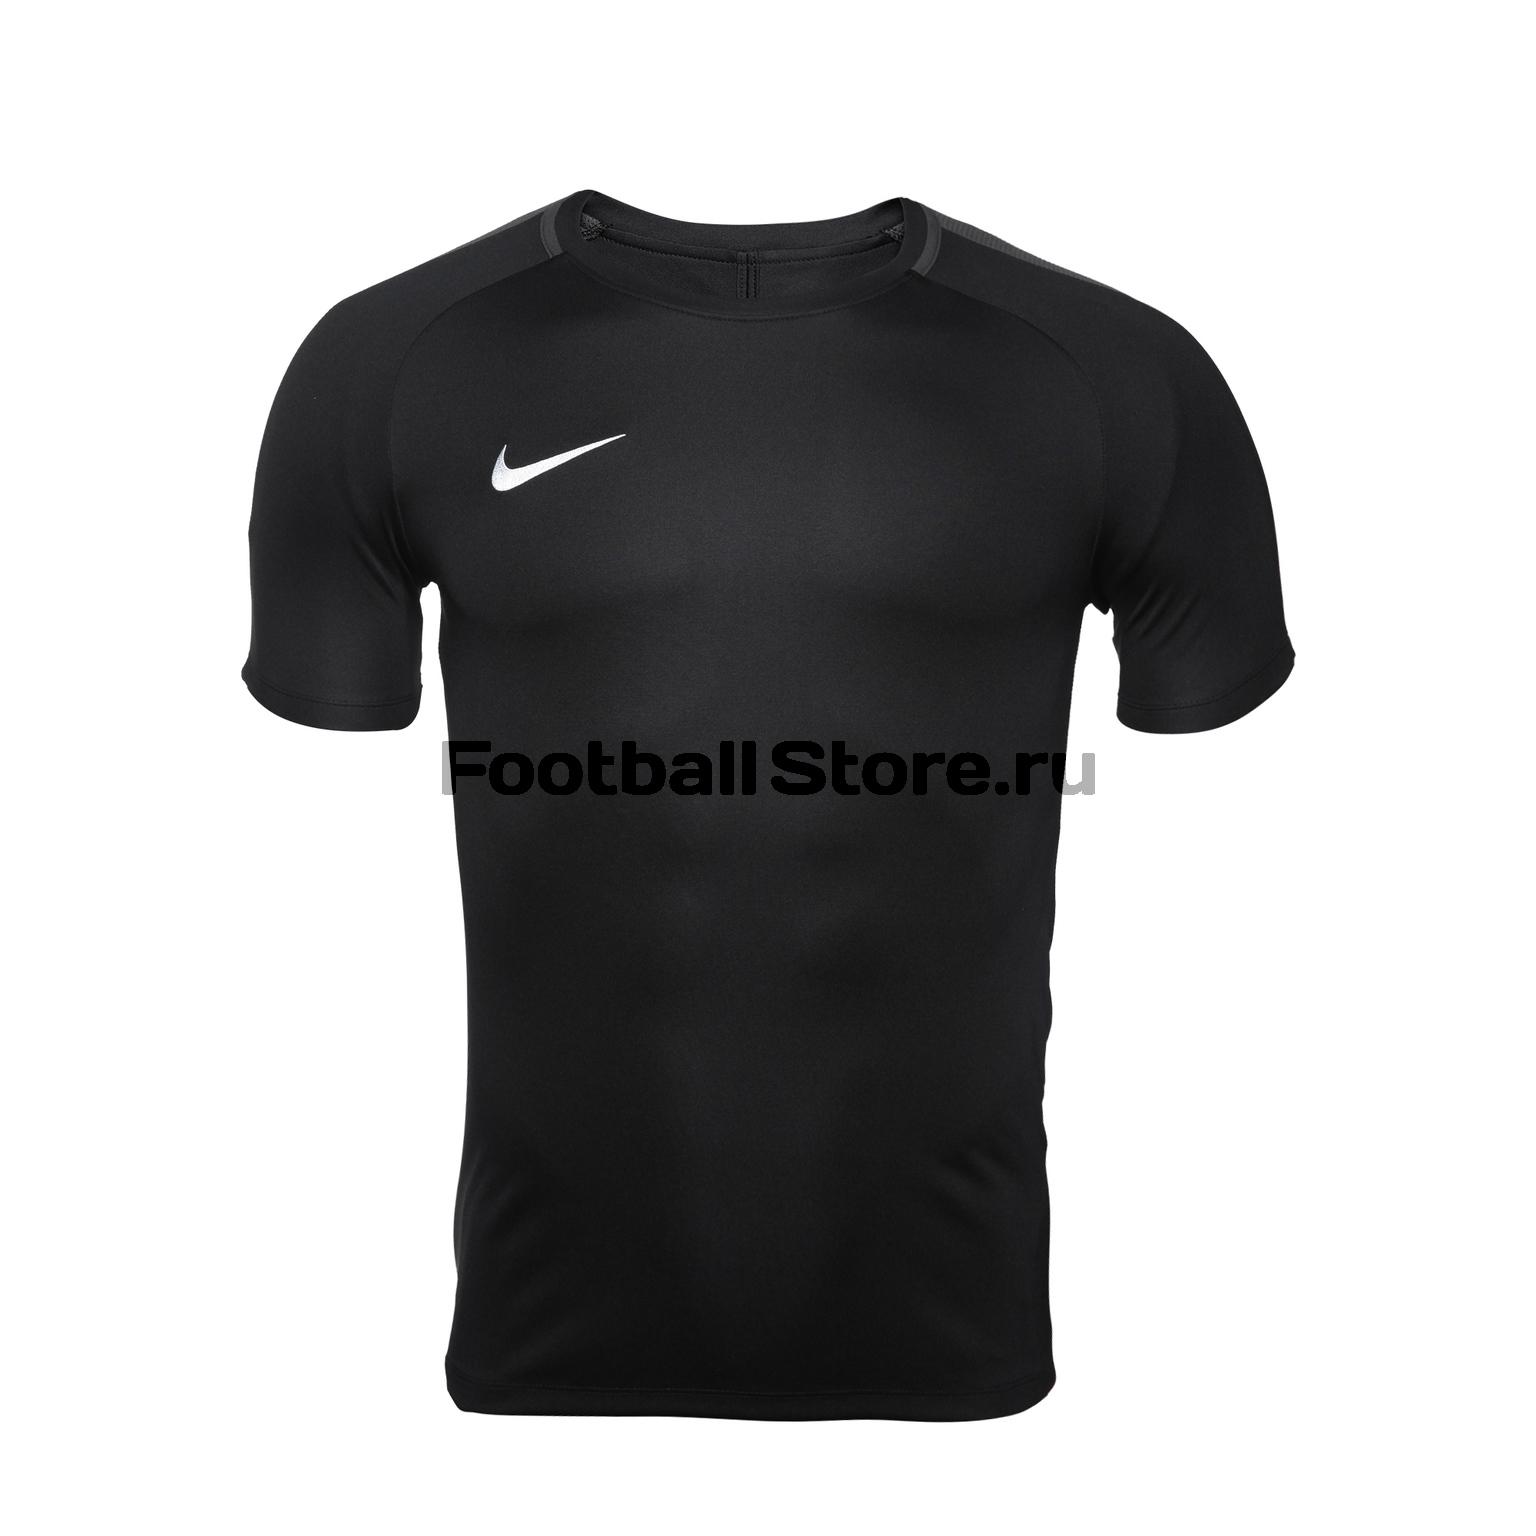 Футболки Nike Футболка тренировочная Nike Dry Academy18 Top SS 893693-010 игровая форма nike футболка детская nike ss precision iii jsy boys 645918 410